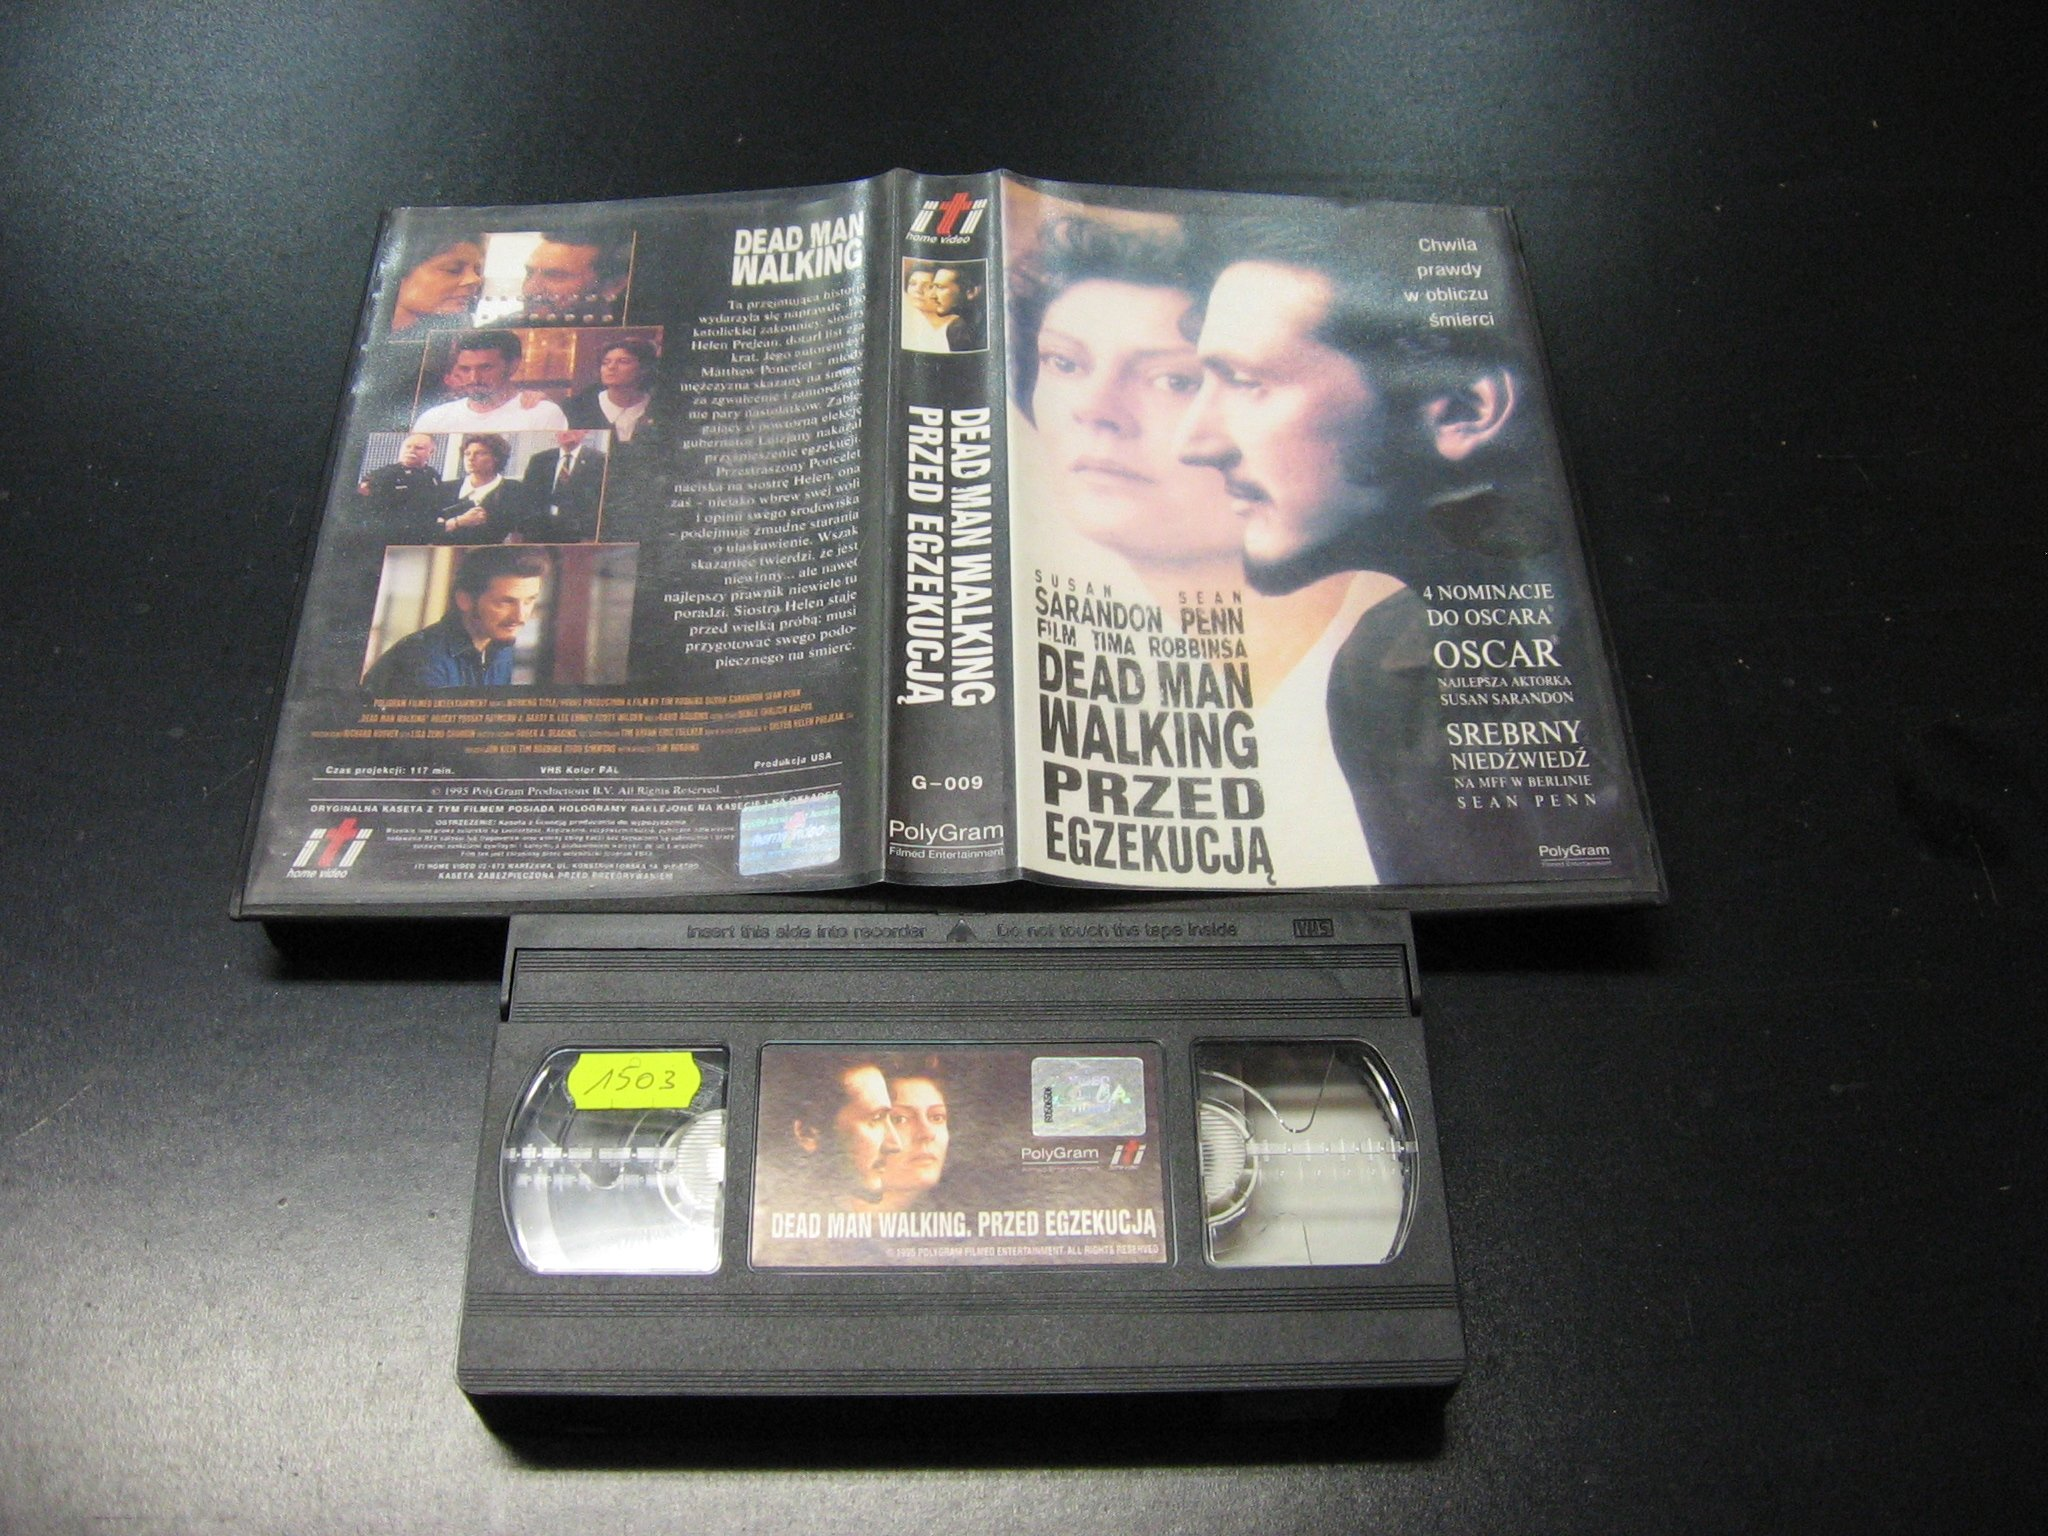 PRZED EGZEKUCJĄ -  kaseta VHS - 0995 Opole - AlleOpole.pl